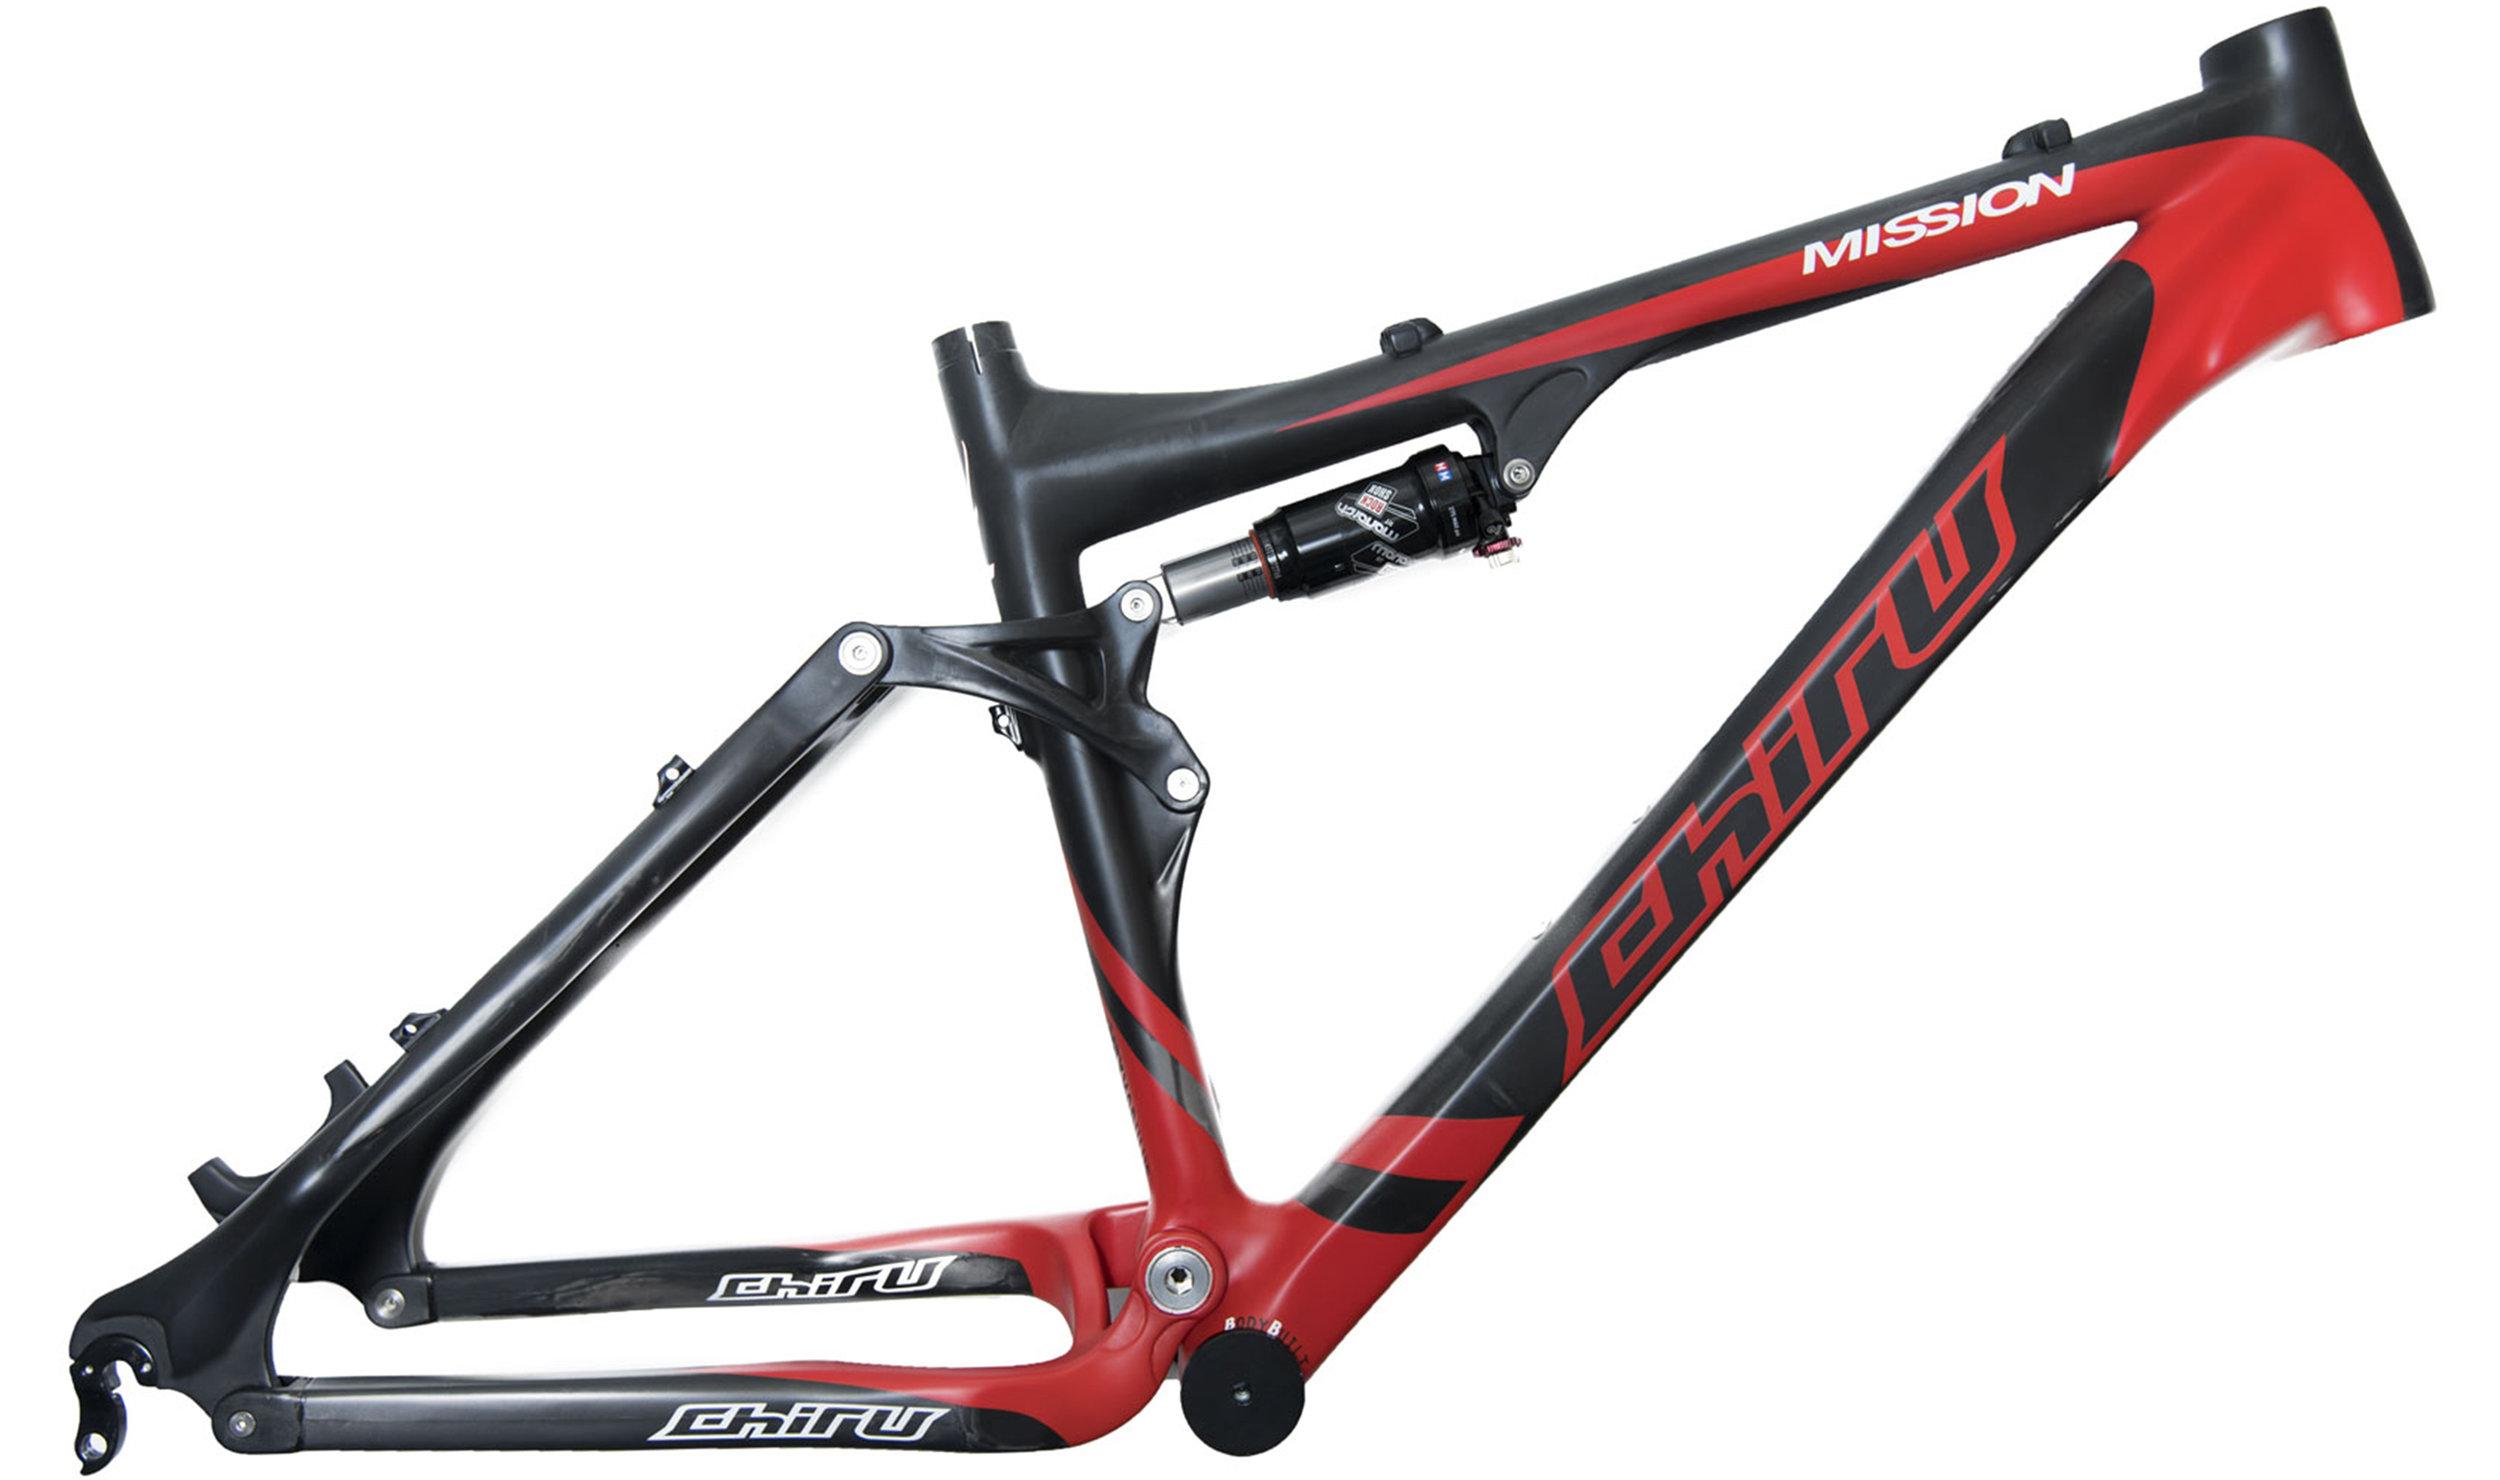 MISSION-Mountain-Bike-Bicycle-Cycle-Carbon-Endurance-Frame-Marathon-Power-Transfer-High-Performance-High-End-Adventure-Race-XTERRA-X-Terra.jpg